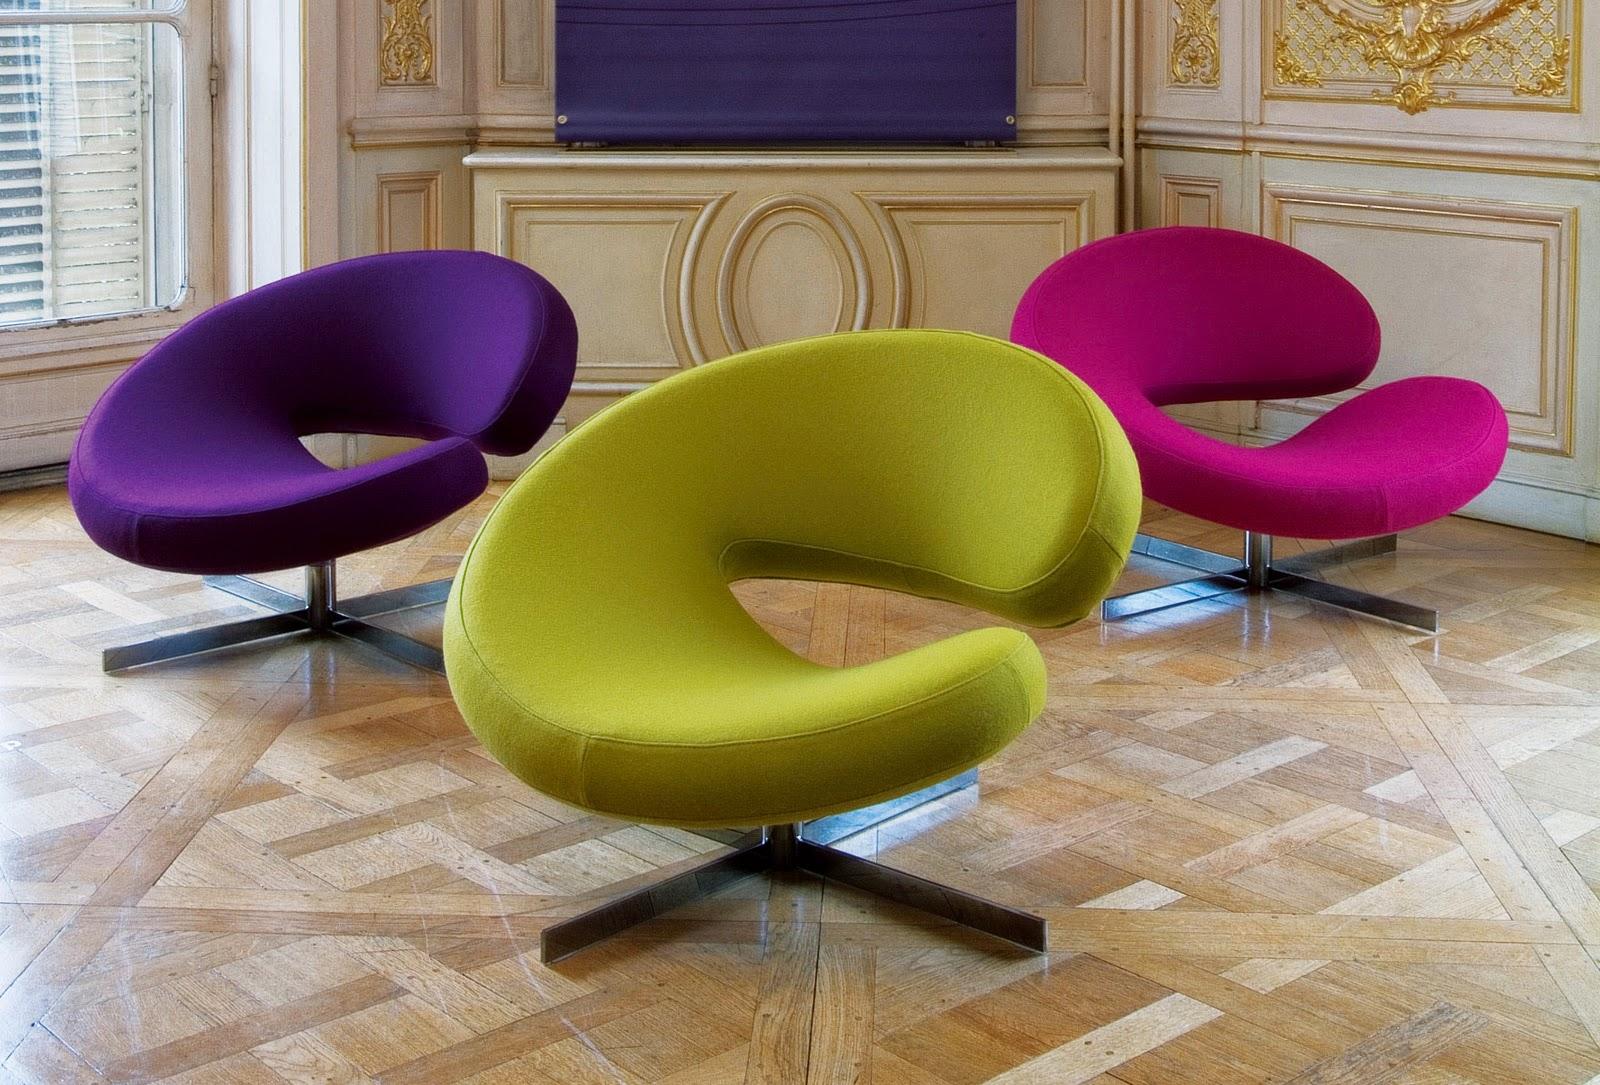 darya girina interior design august 2014. Black Bedroom Furniture Sets. Home Design Ideas